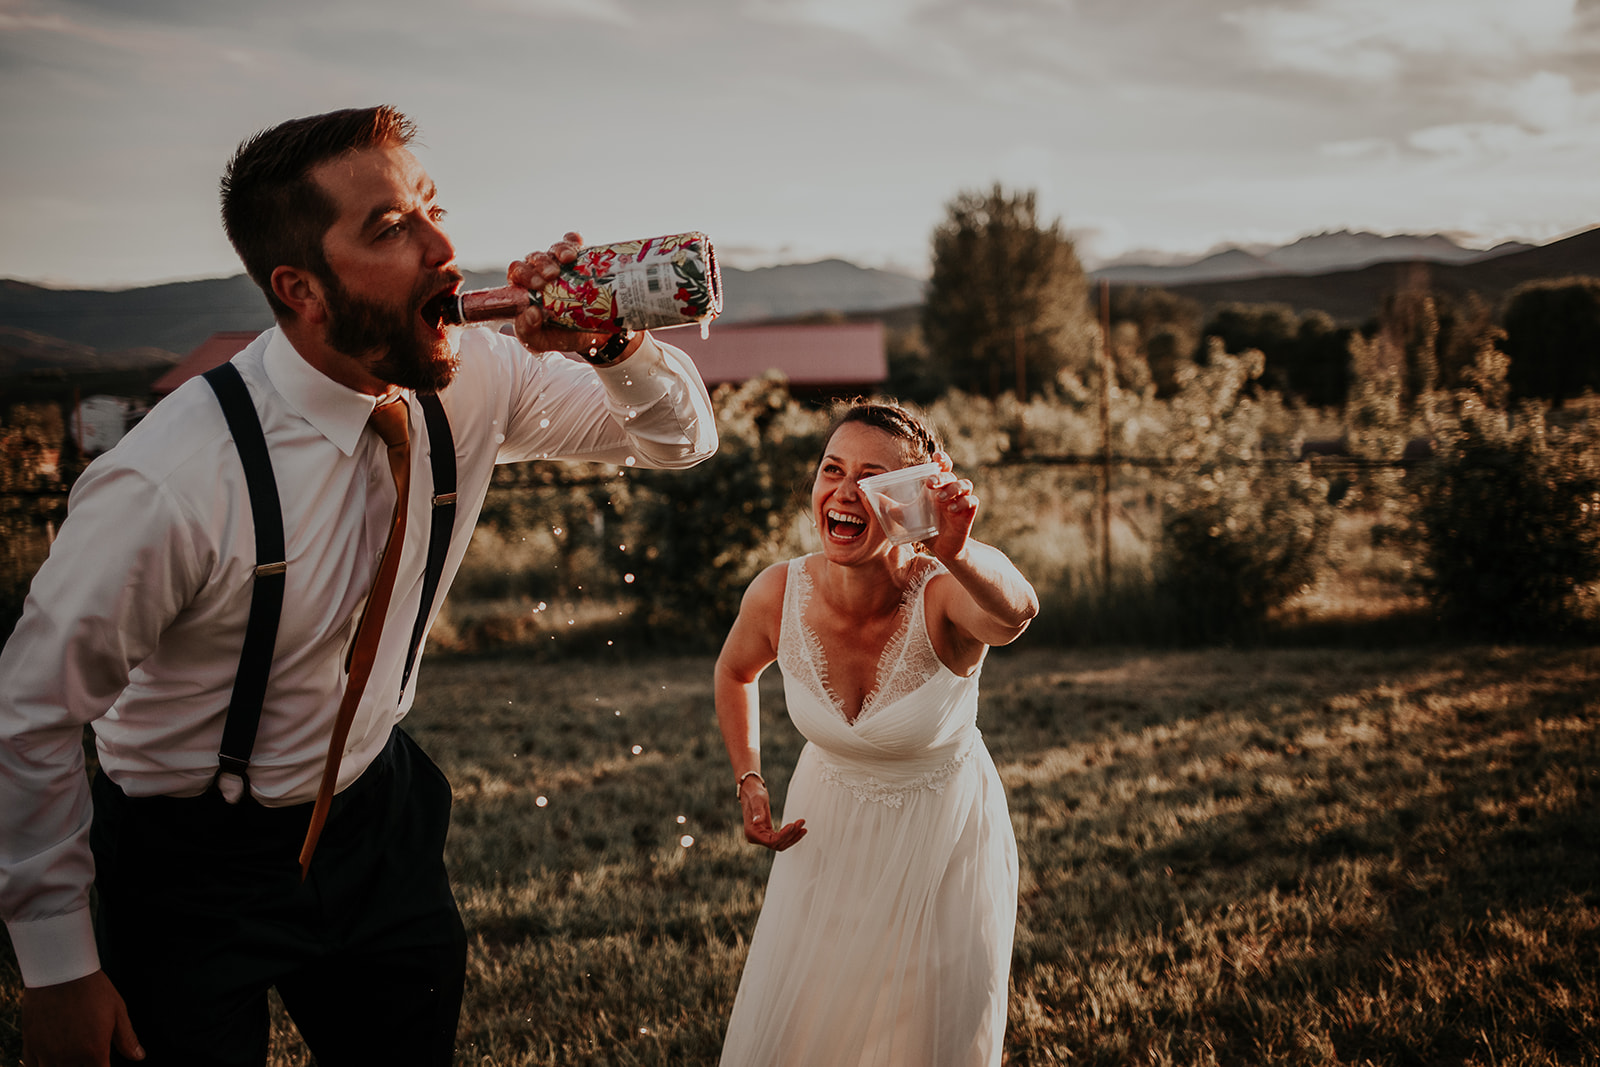 north-cascades-elopement-wedding-winthrop-wedding-photographer-megan-gallagher-photography (37).jpg